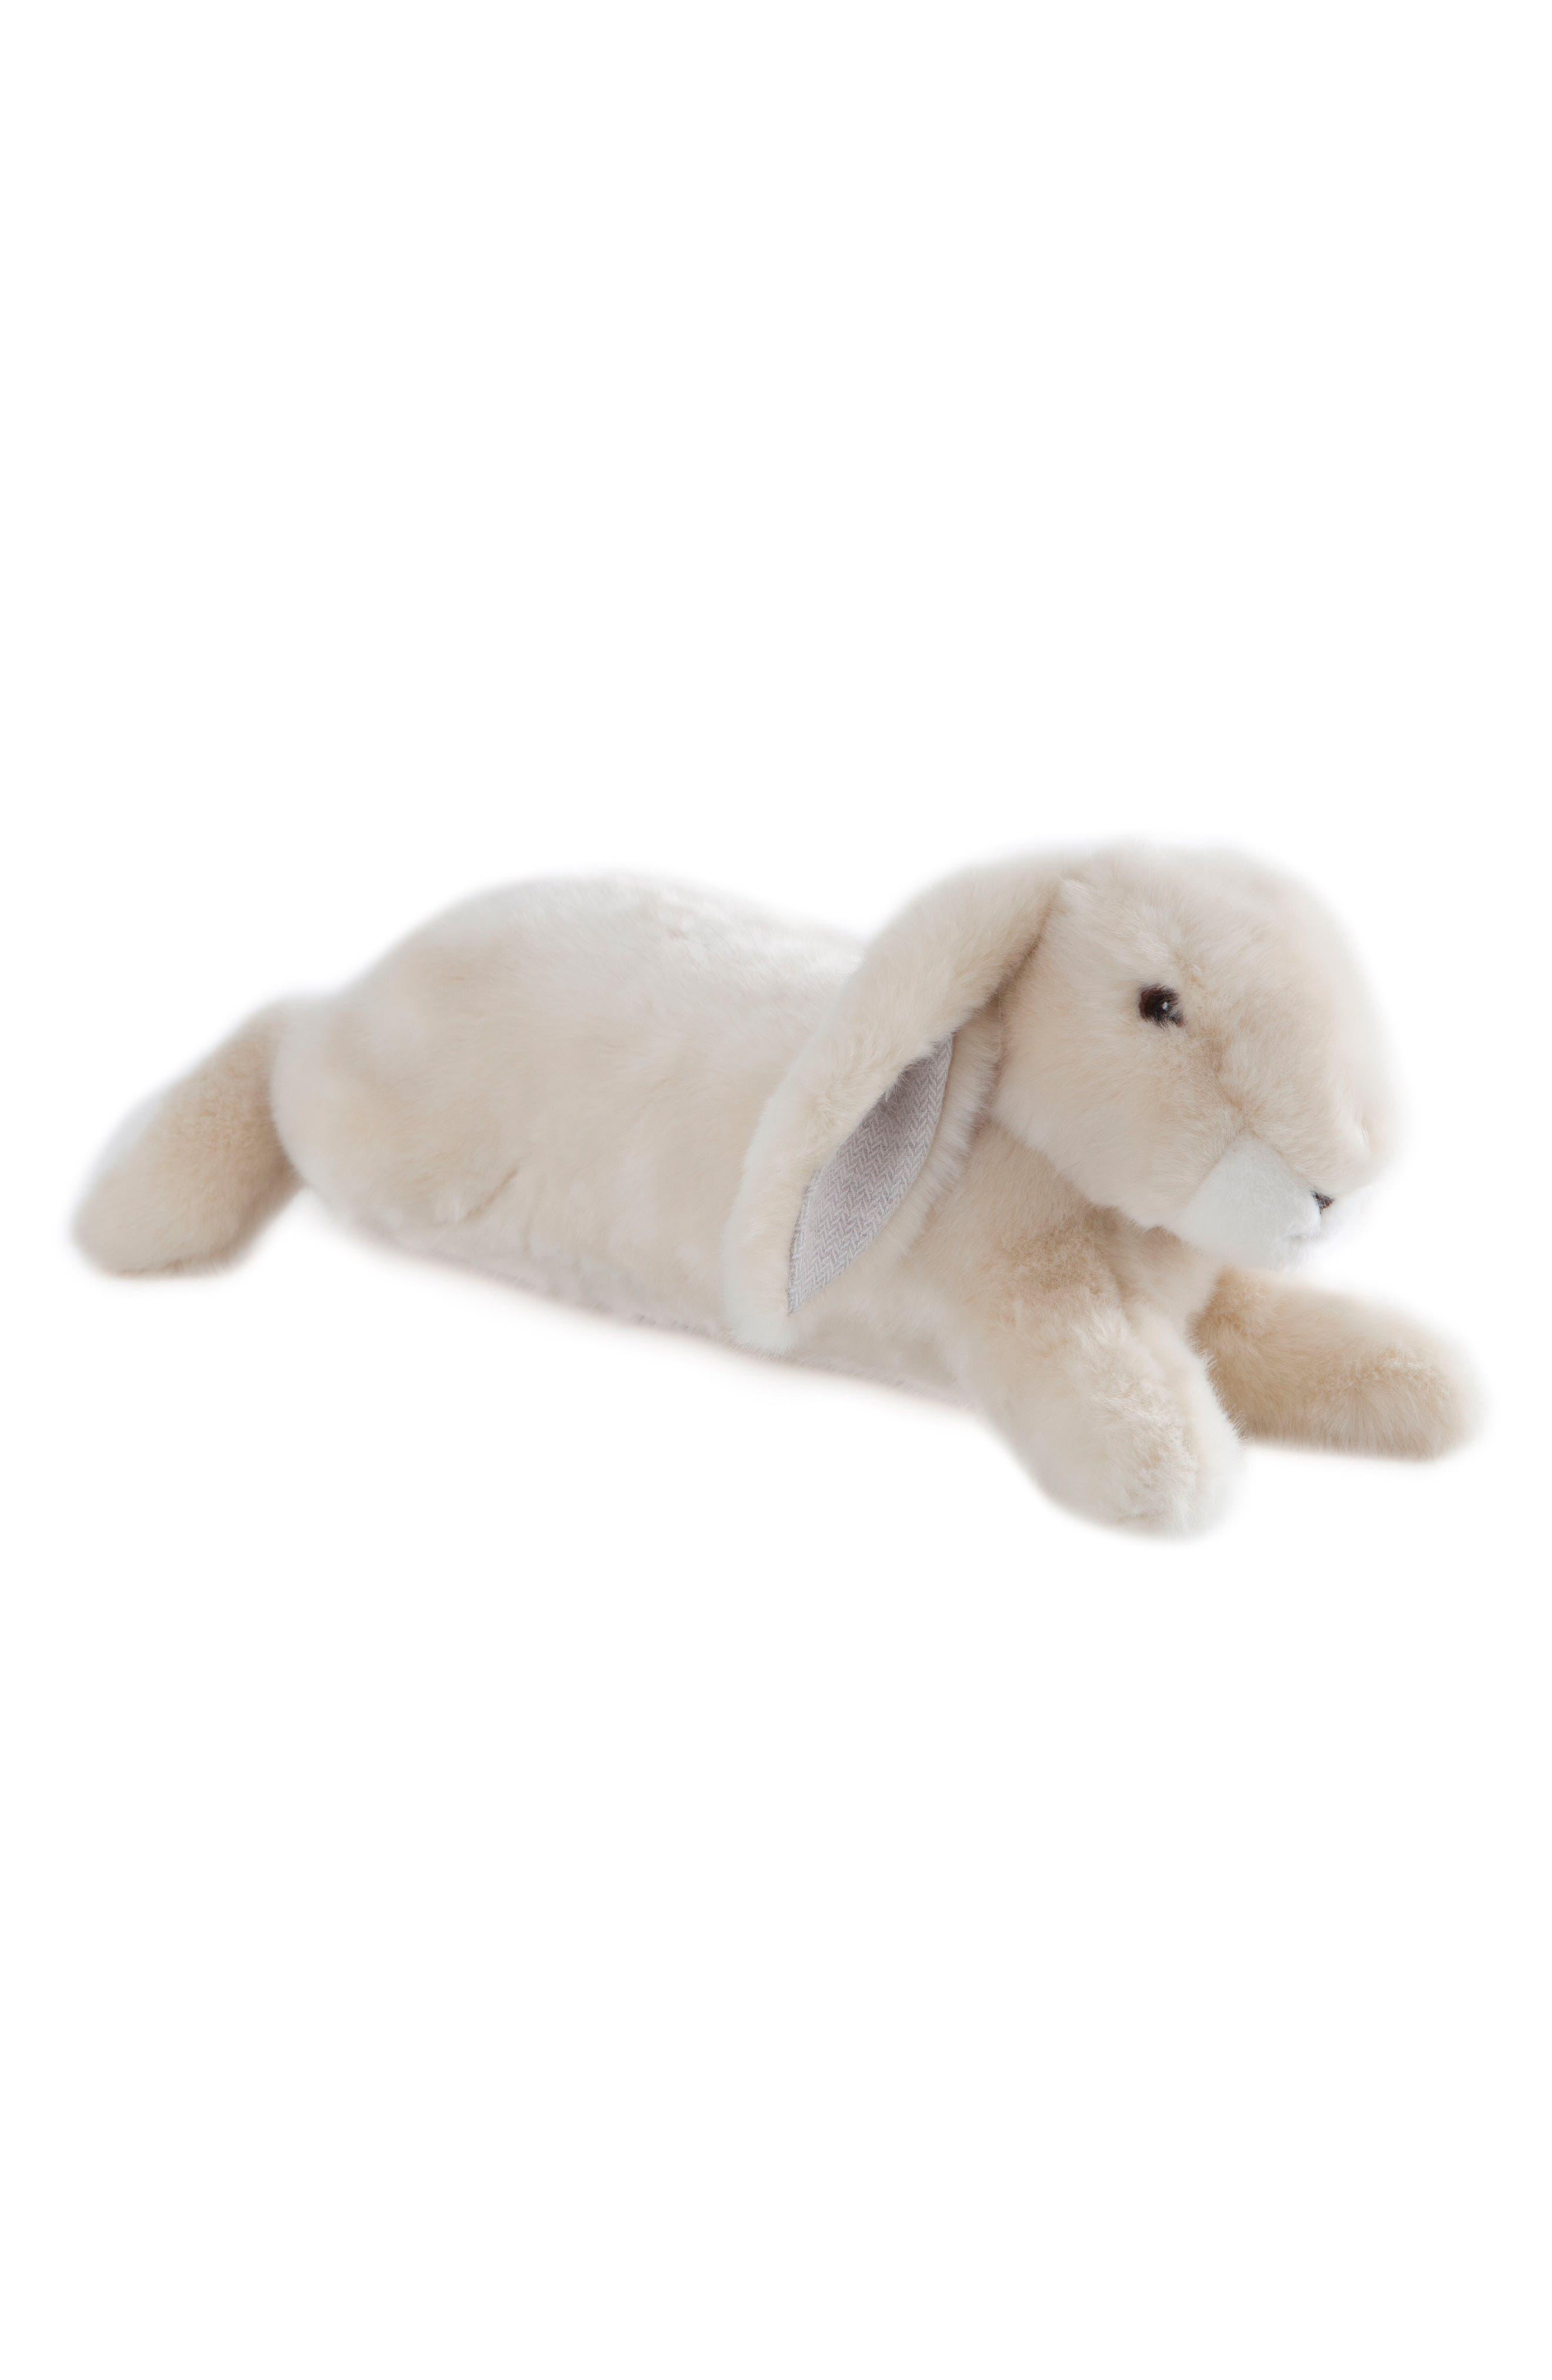 Pamplemousse Peluches Martin the Rabbit Stuffed Animal